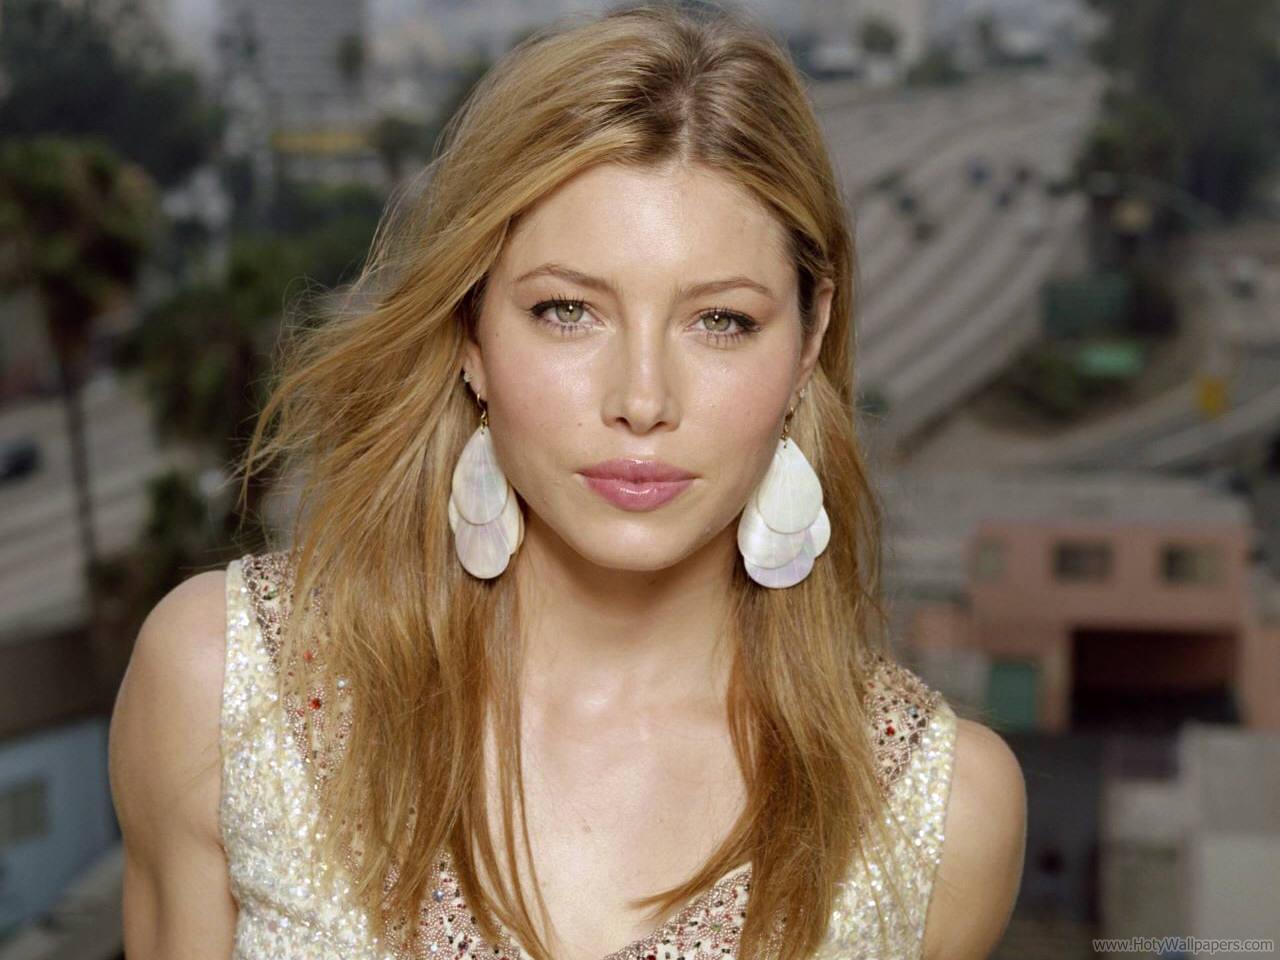 http://1.bp.blogspot.com/-KXjhX36qe0s/TrazaElkzJI/AAAAAAAAPjs/ty5OXoSQbEo/s1600/jessica_biel_actress_latest_wallpaper-02-1600x1200.jpg